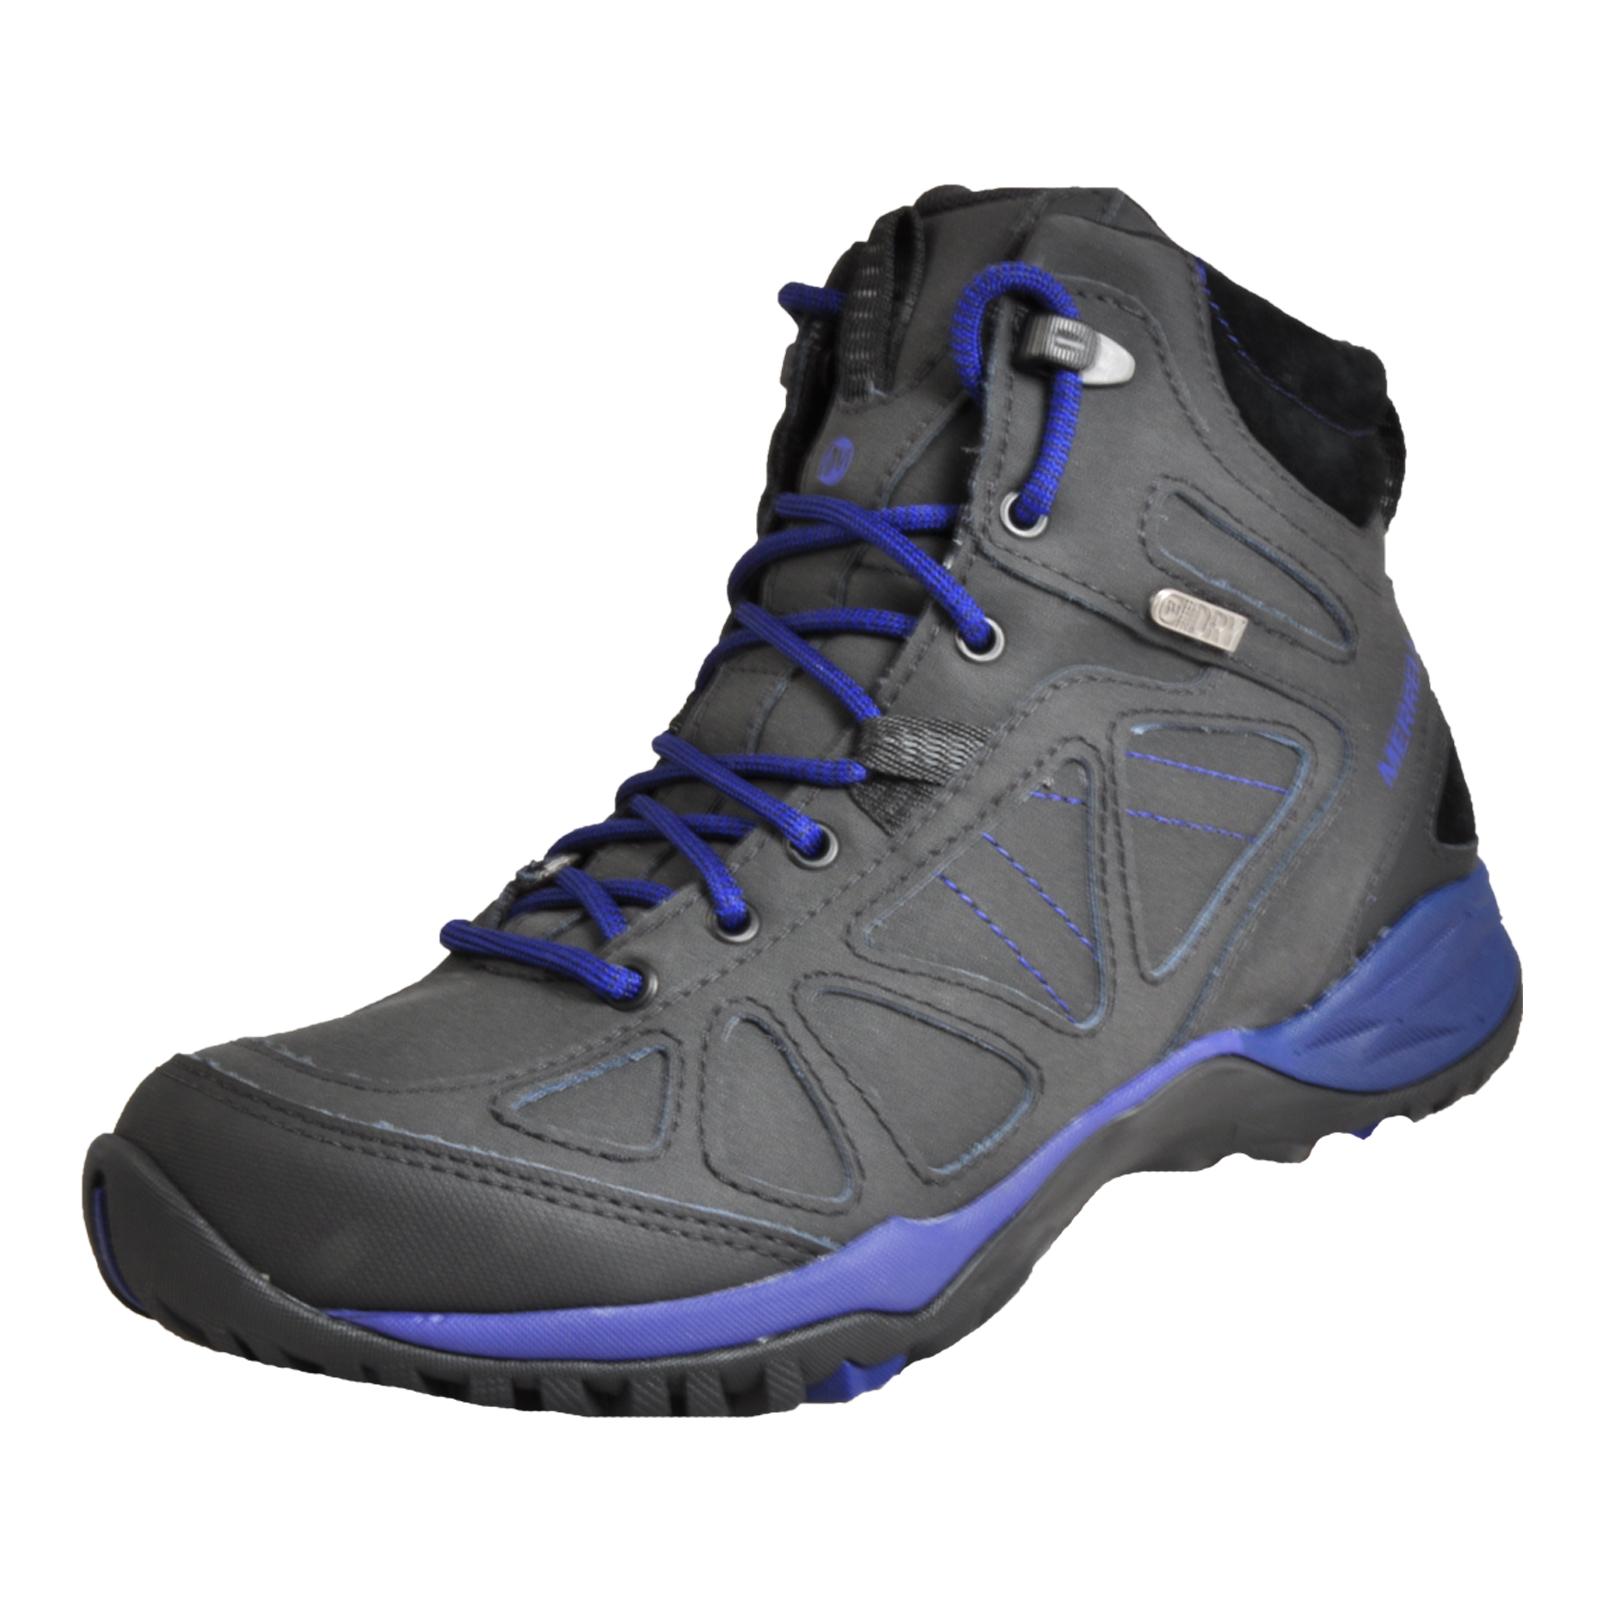 a9b4f0853249 Merrell Siren Q2 Waterproof Mid Women s Outdoor Hiking Walking Boots Black